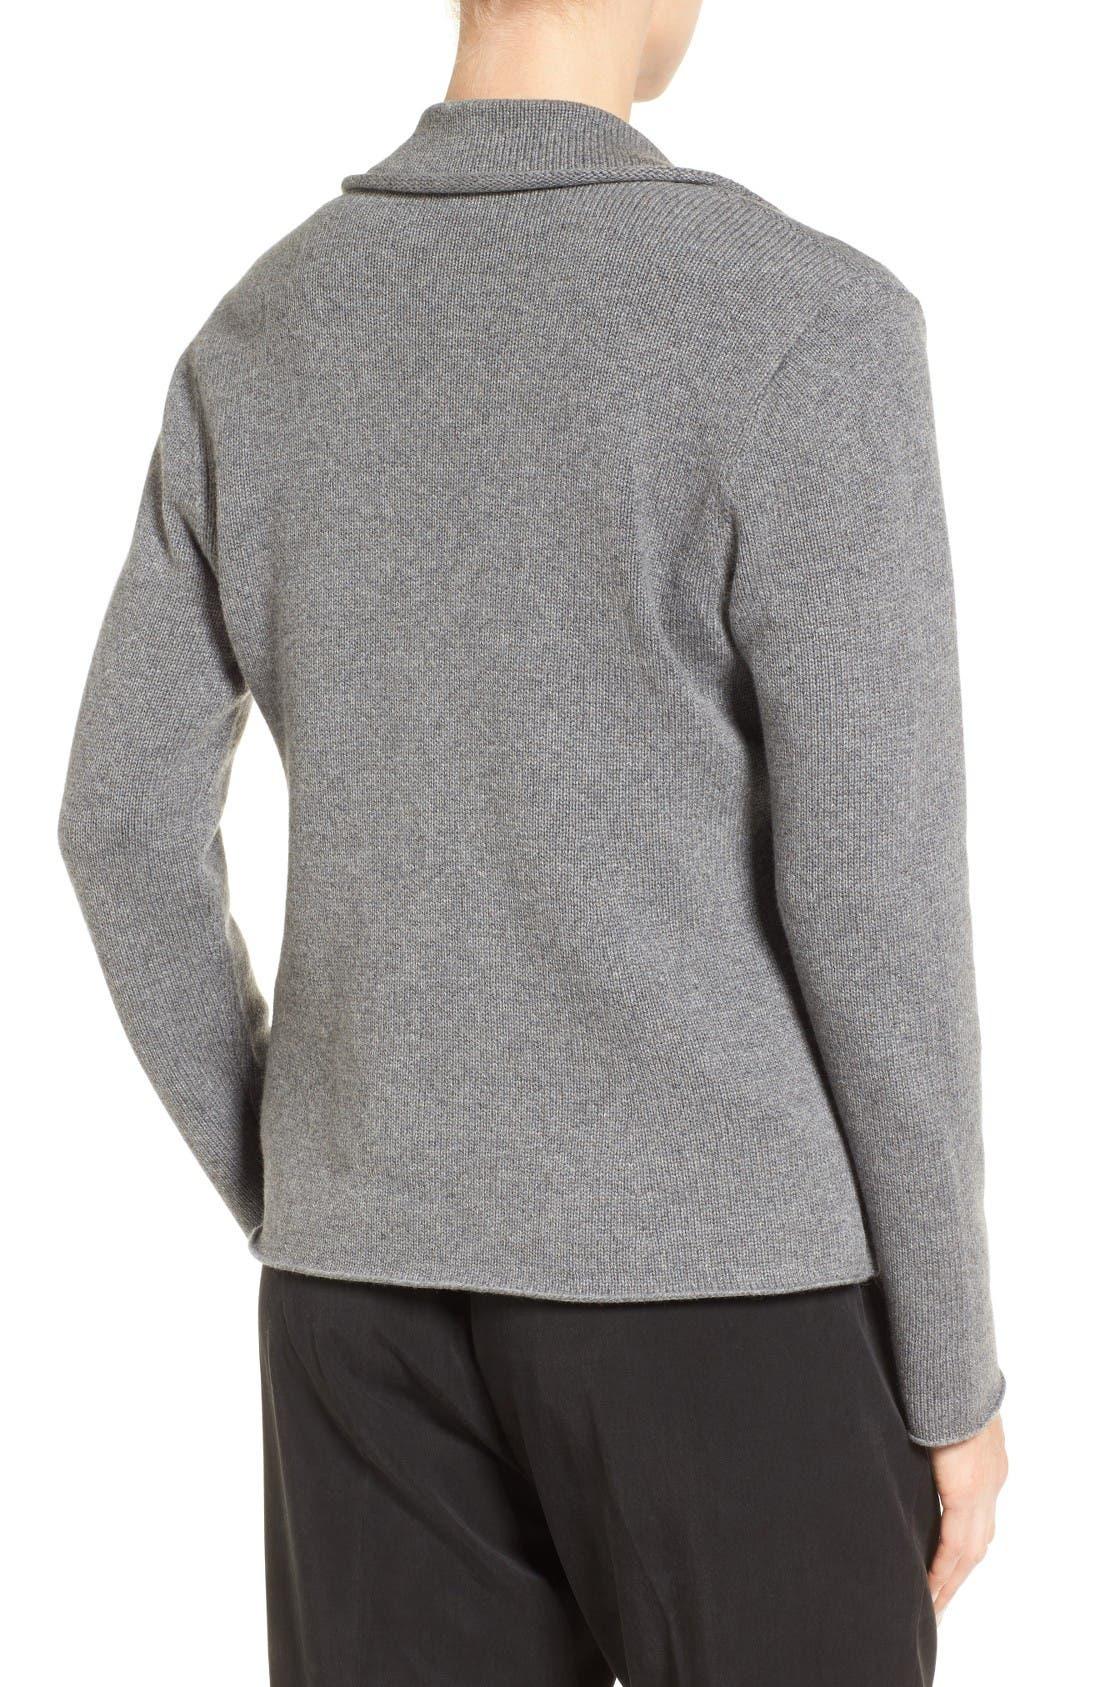 Alternate Image 2  - Eileen Fisher Recycled Cashmere & Merino Wool Sweater Jacket